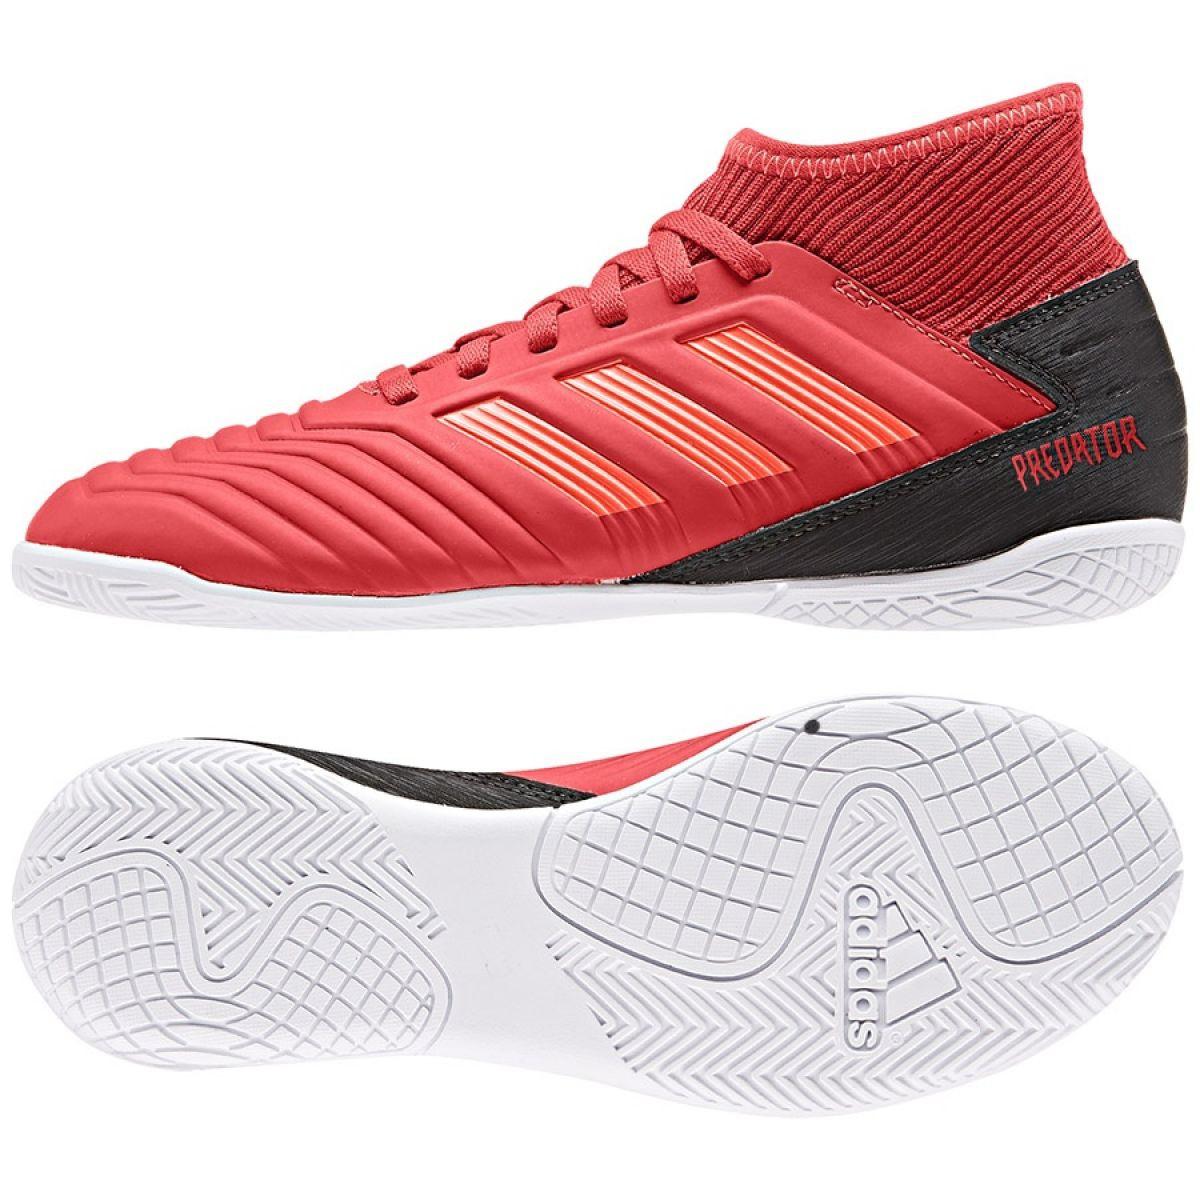 3 Indoor Adidas Jr Predator Cm8544 Schuhe 19 In xBthQdosrC